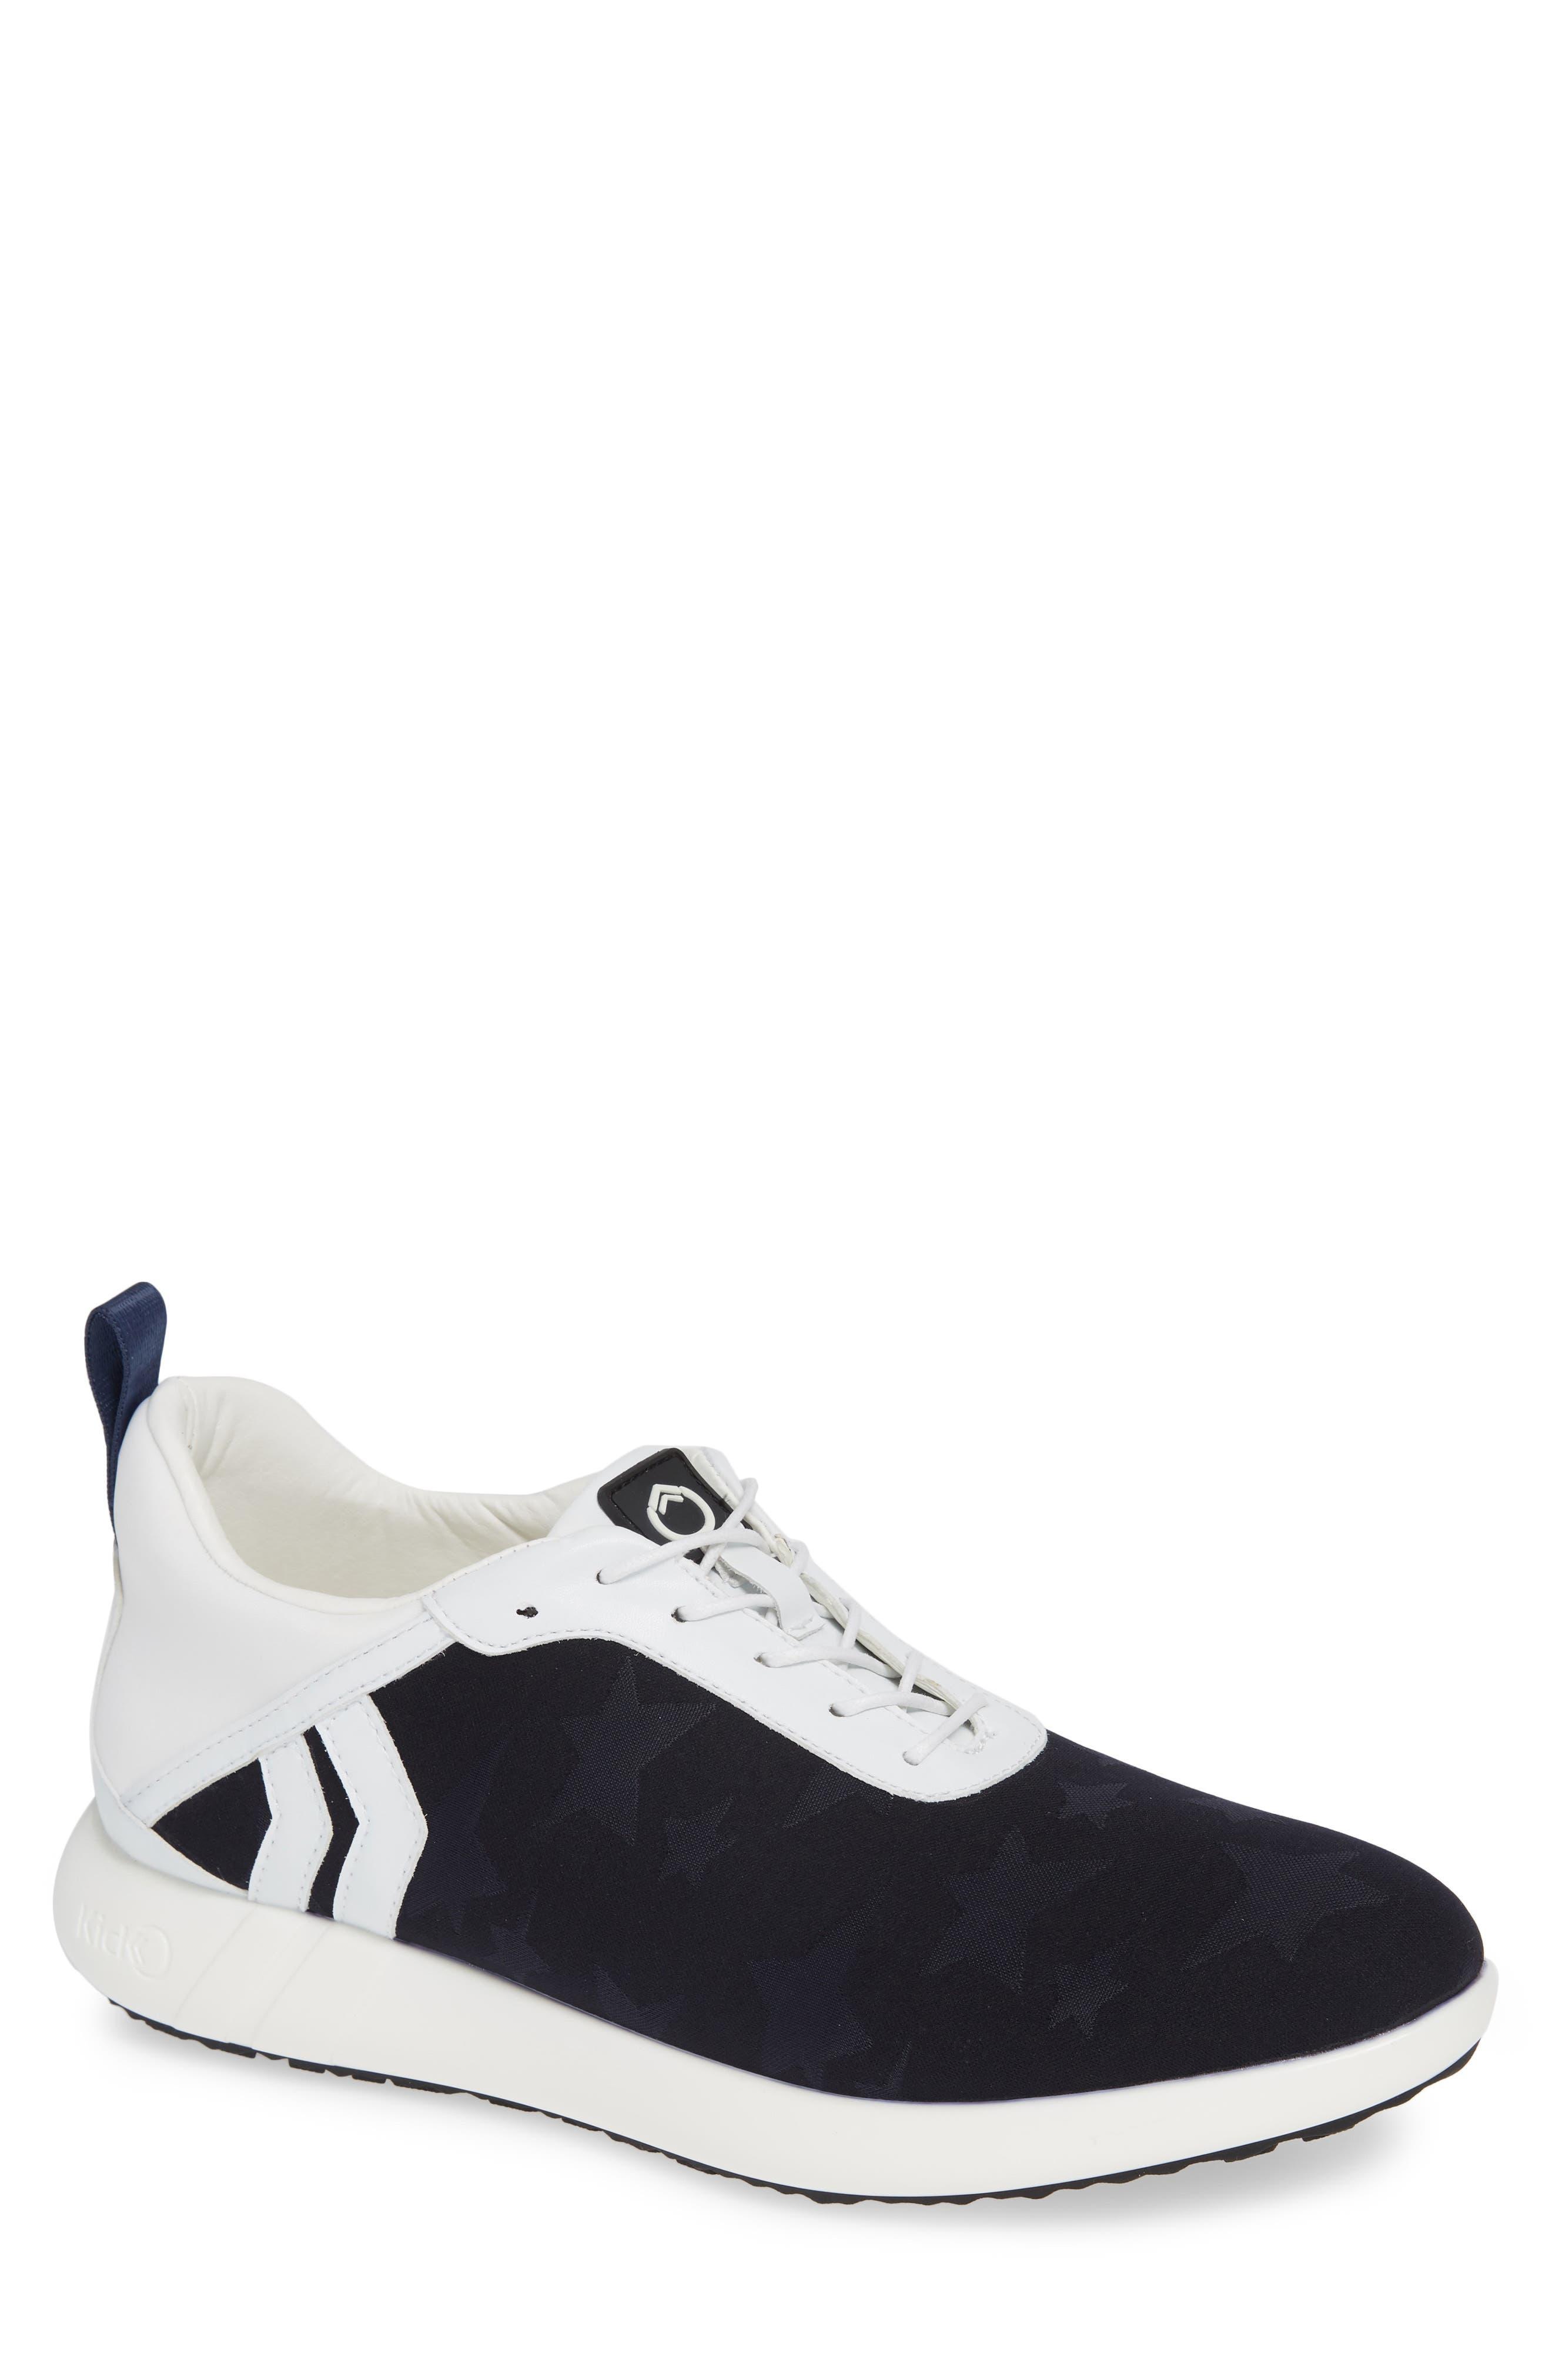 Astro Sneaker,                             Main thumbnail 1, color,                             410